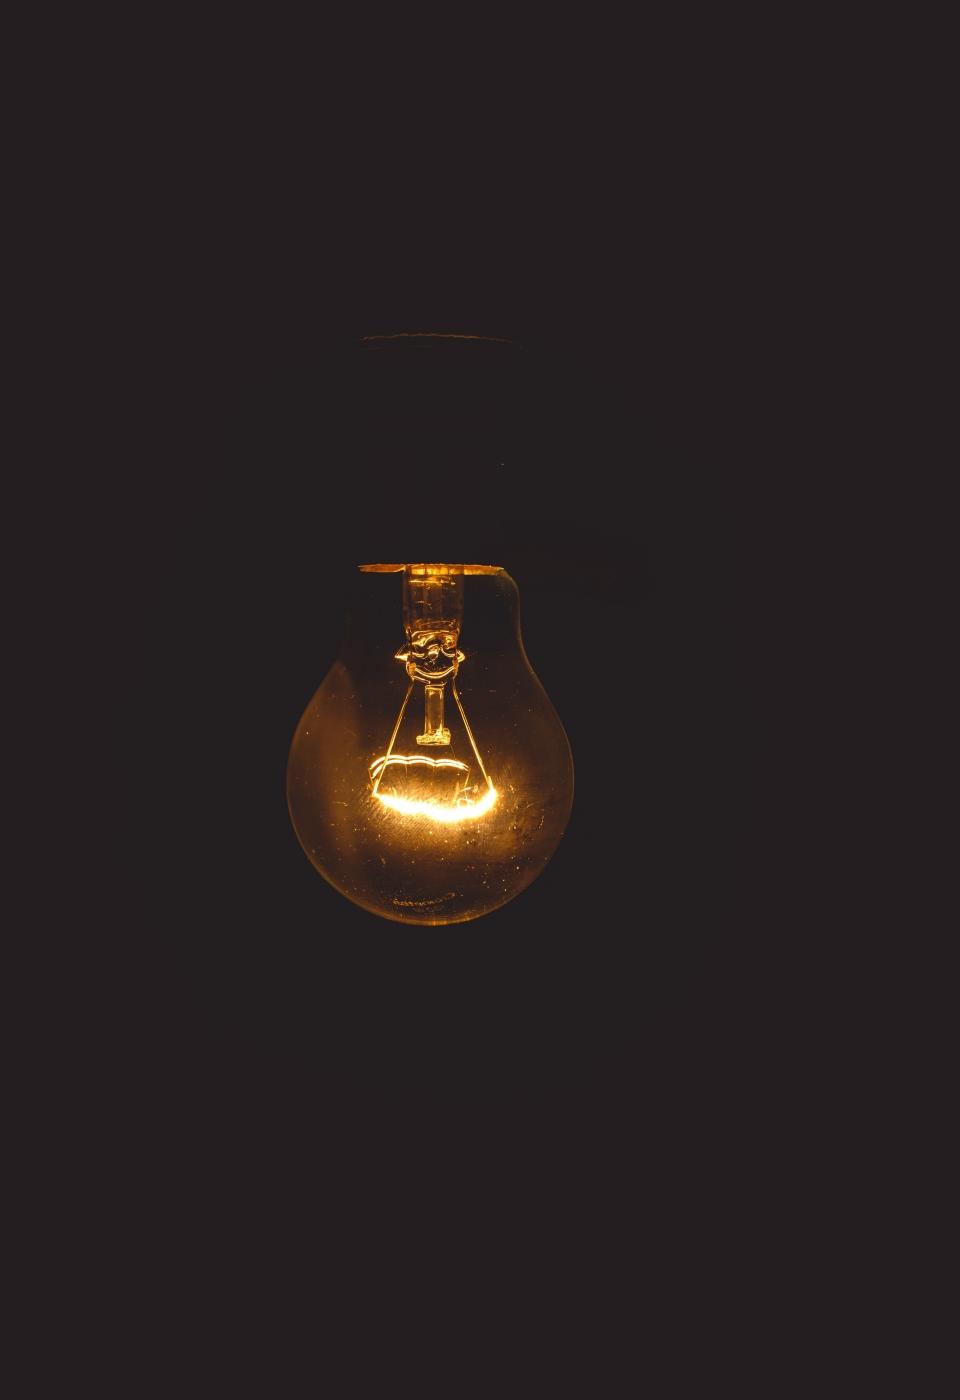 black-background-bulb-close-up-716398@2x